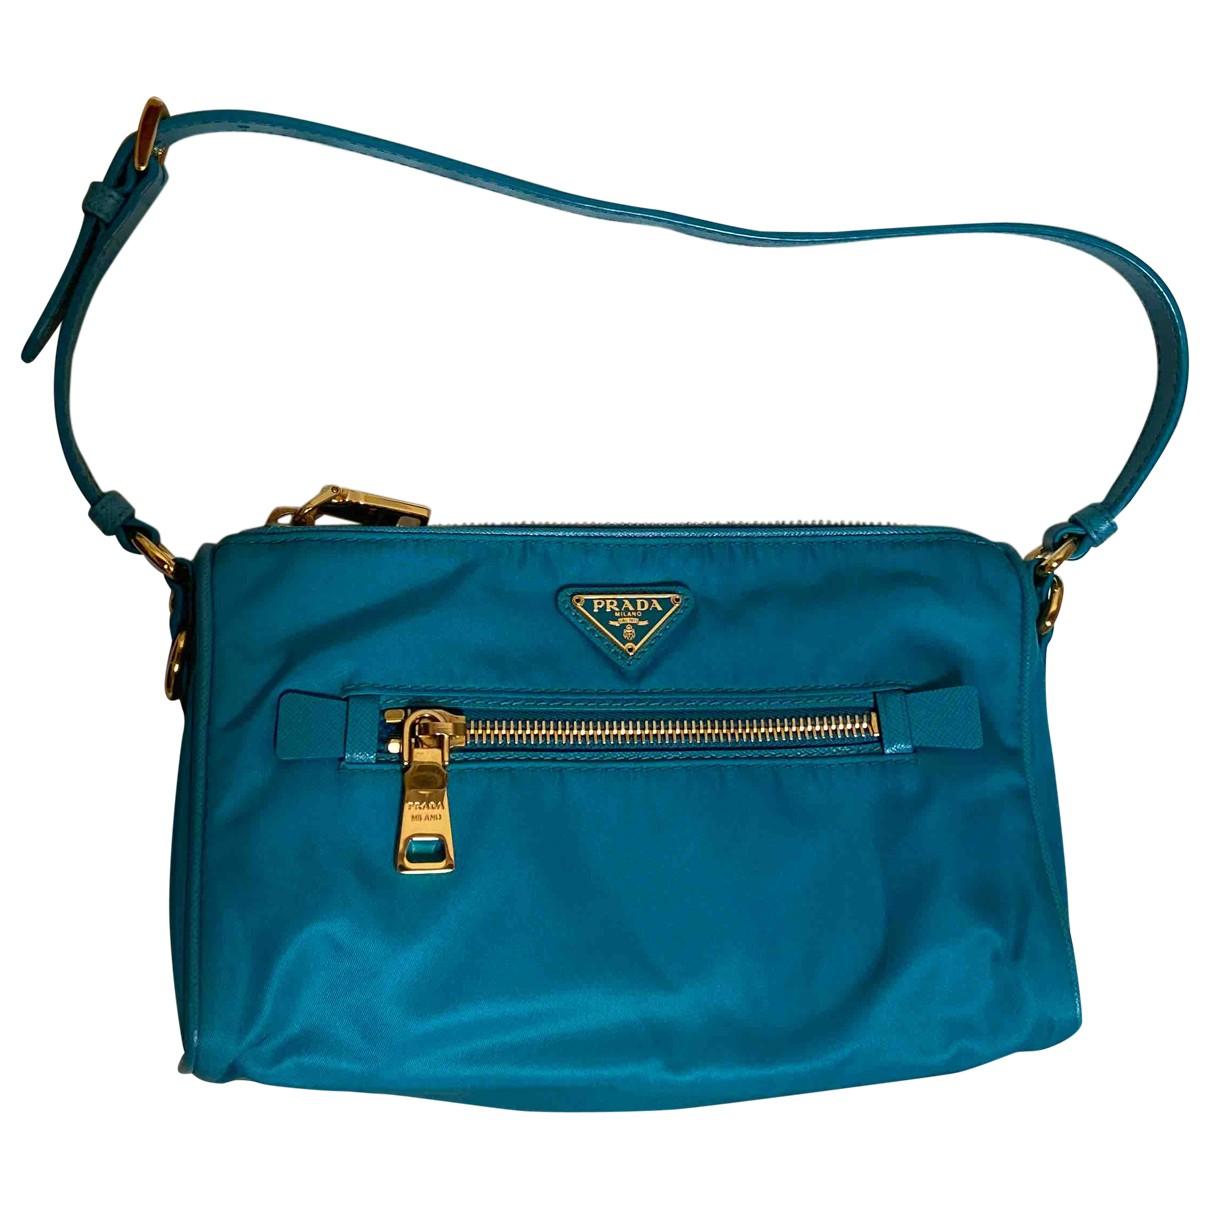 Prada \N Turquoise handbag for Women \N